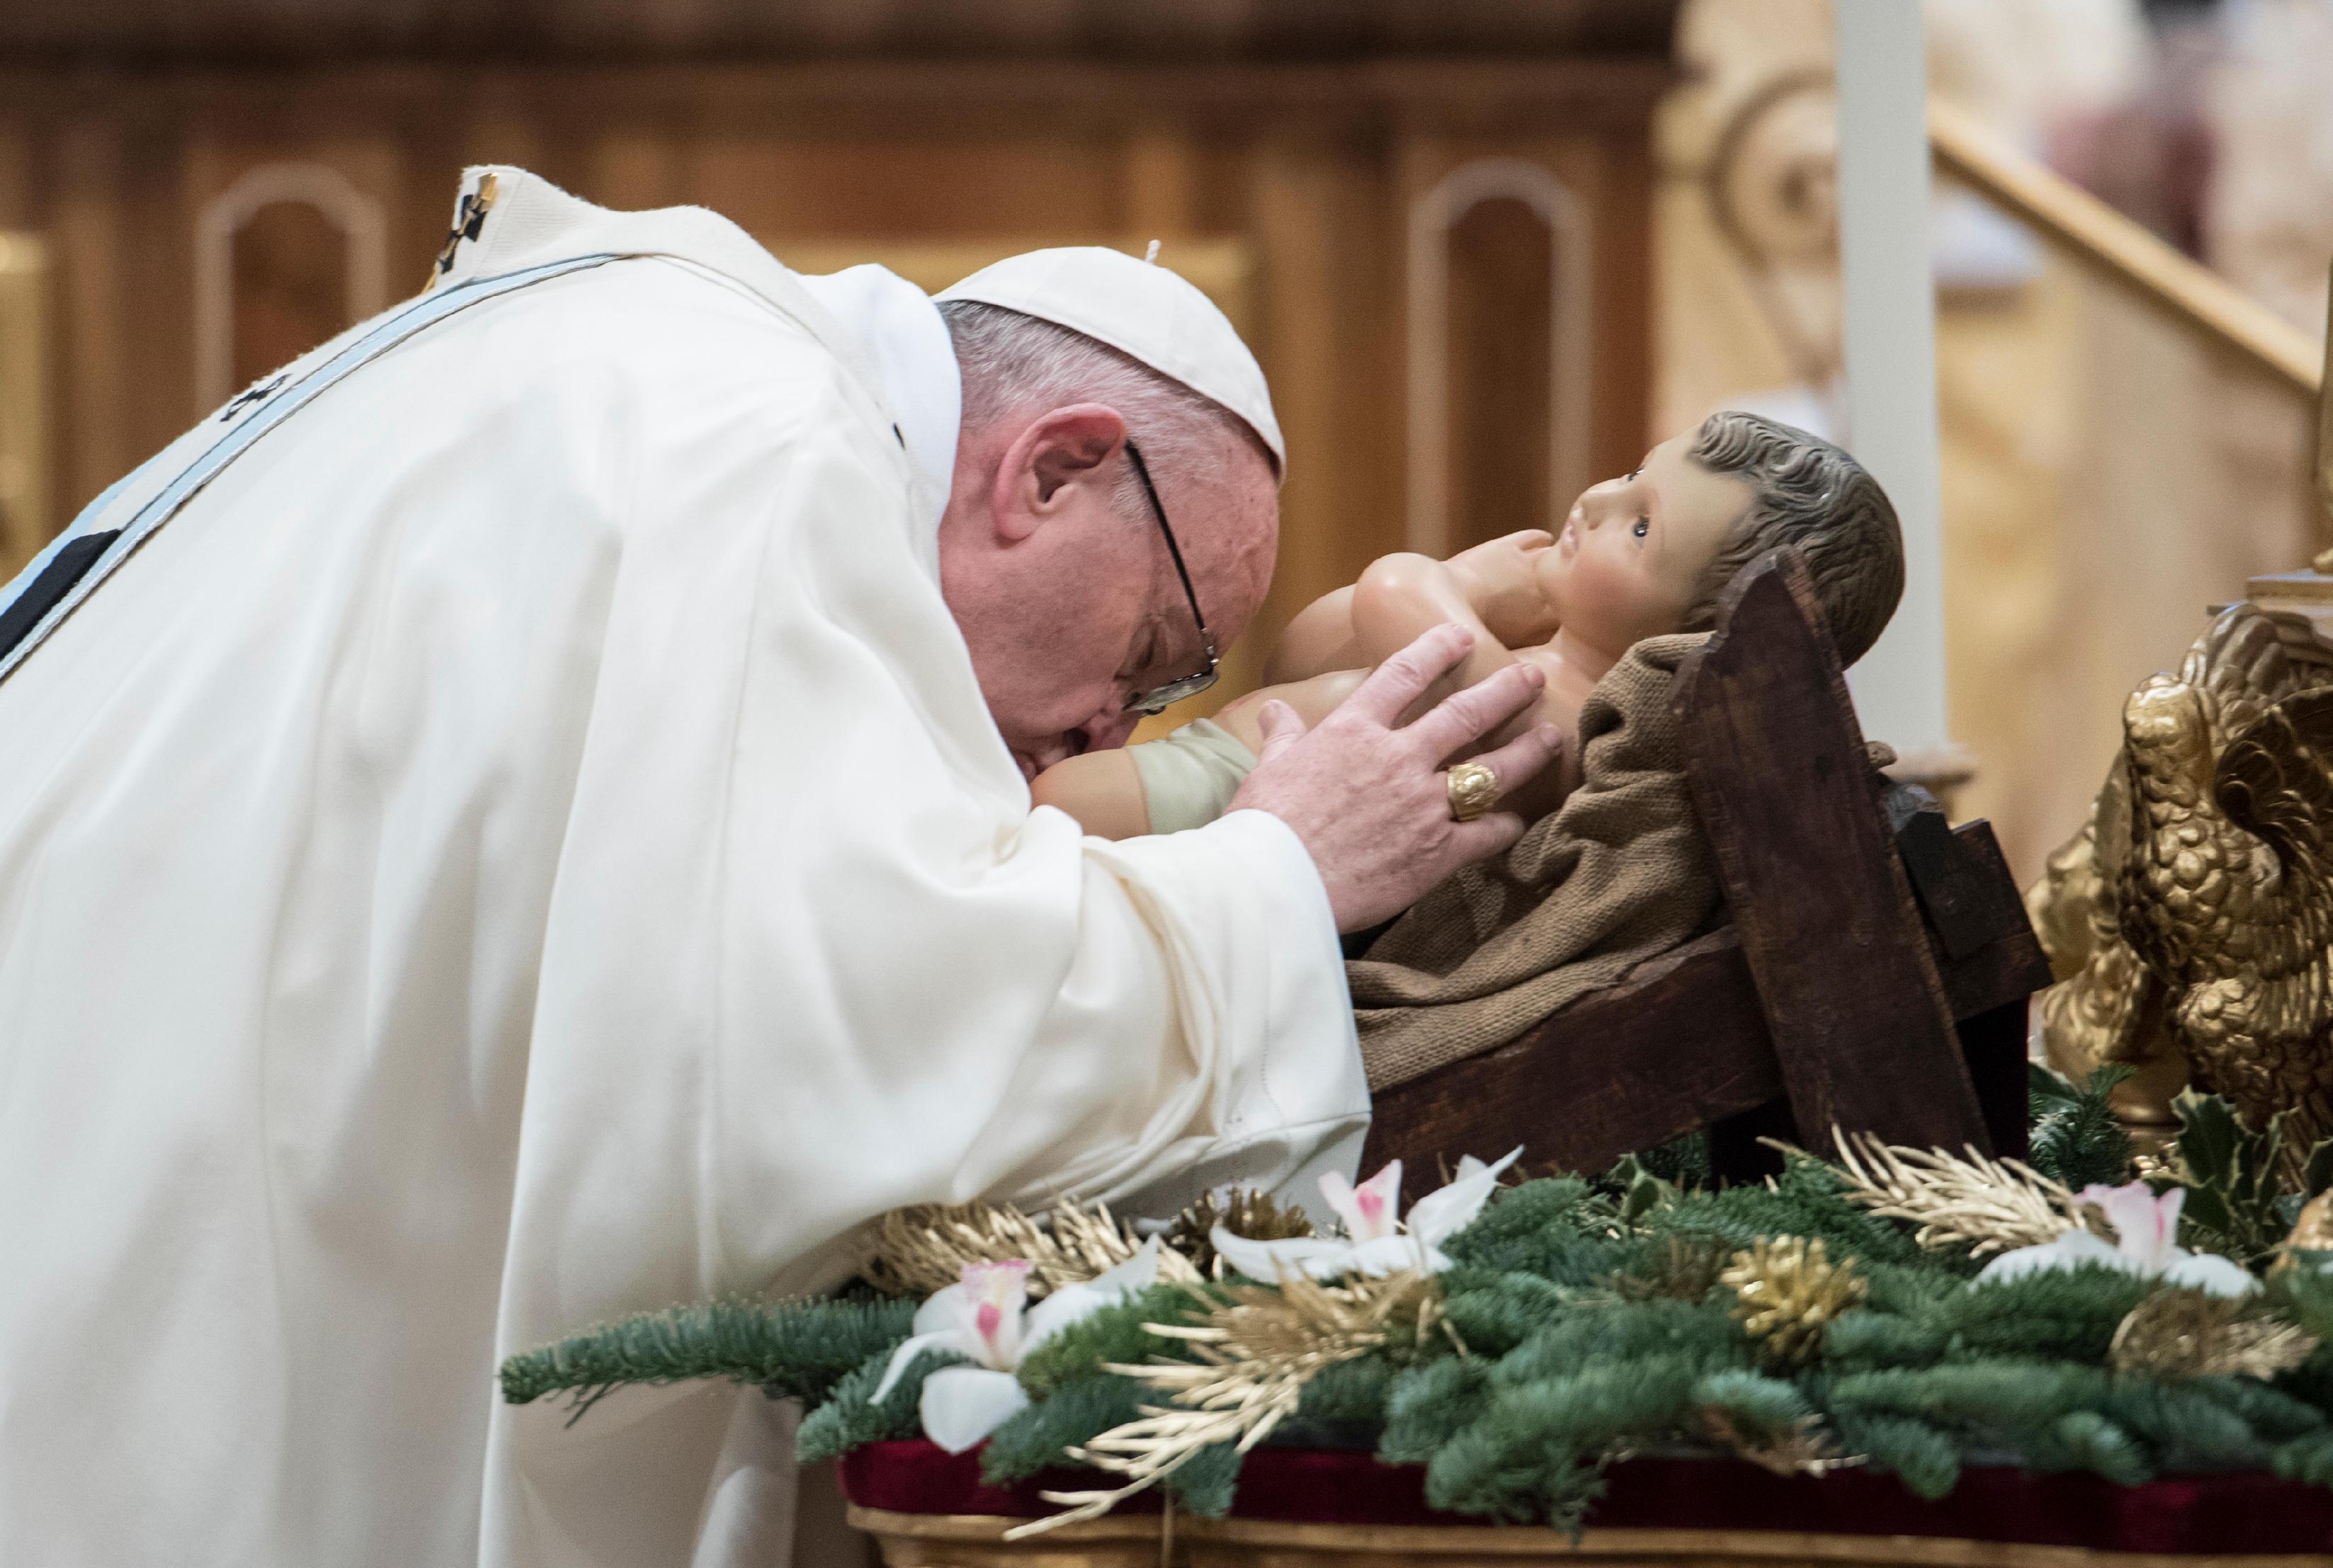 Messe de ste Marie Mère de Dieu, 1/01/2018 © L'Osservatore Romano